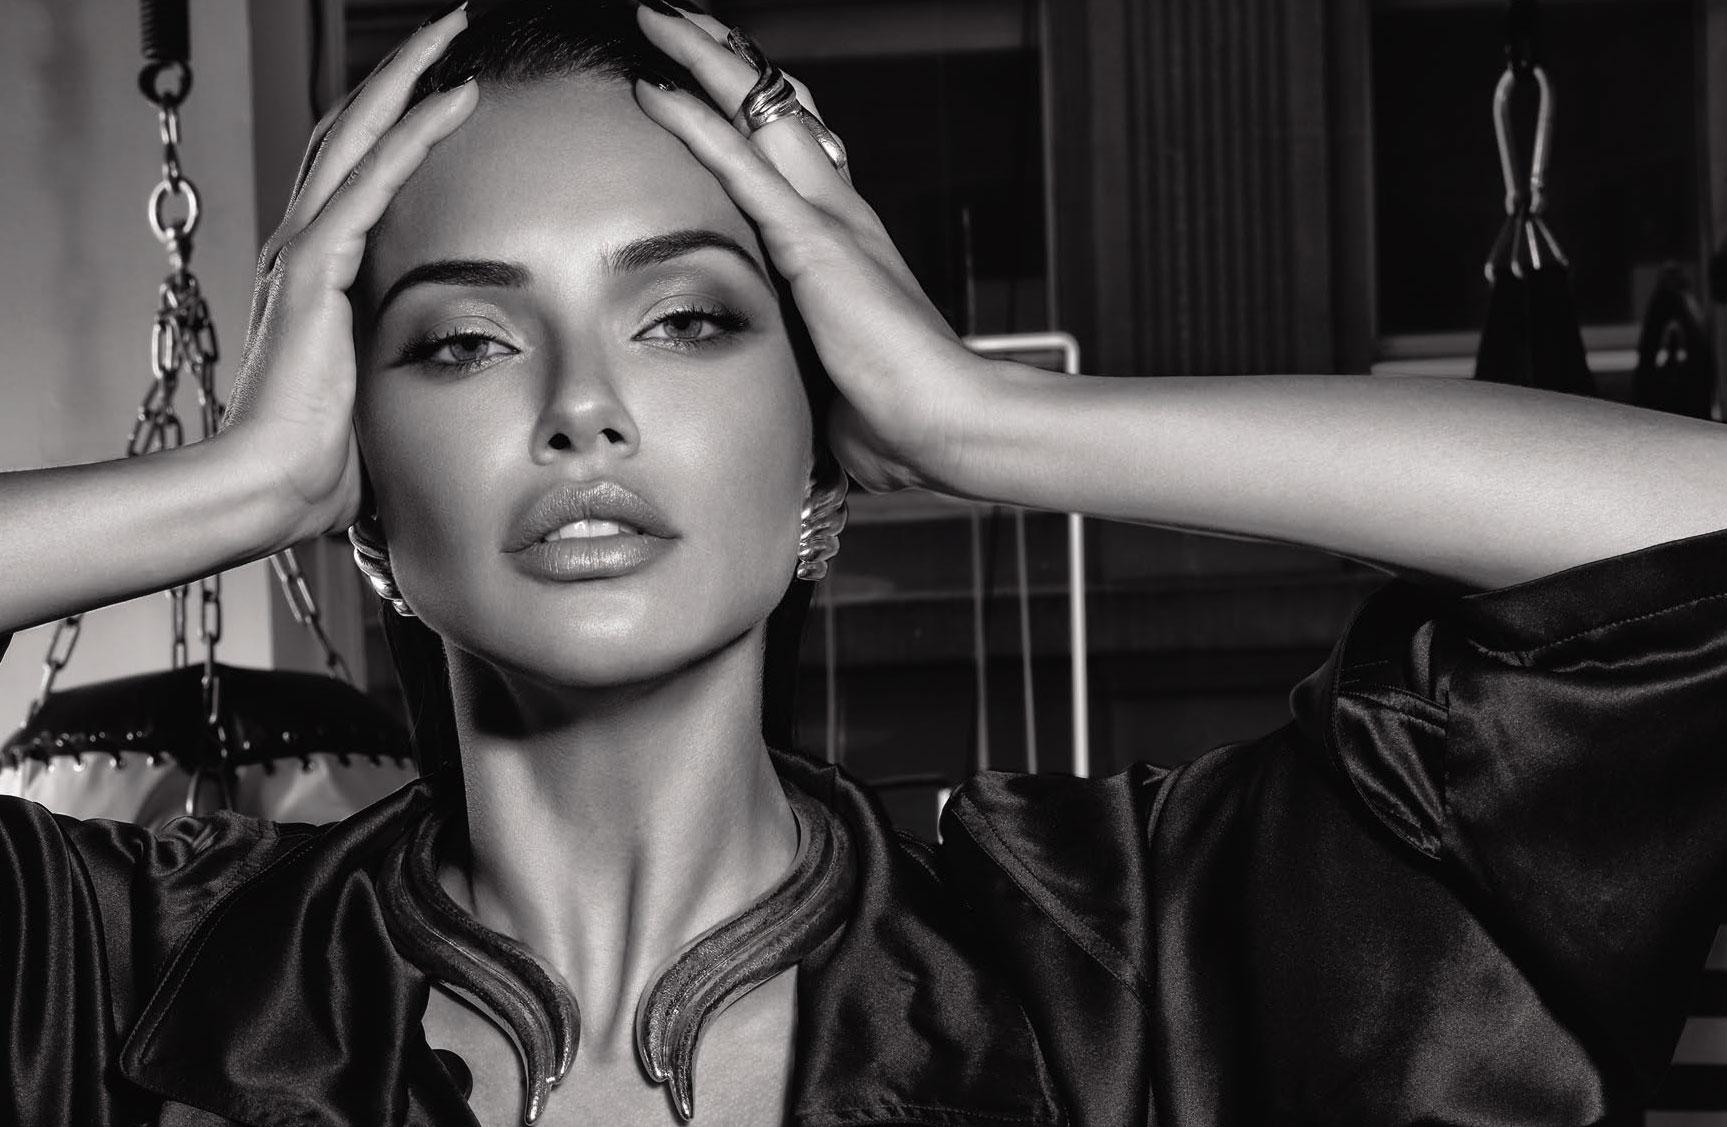 Супер-женщина Адриана Лима в журнале Numero Россия / фото 11